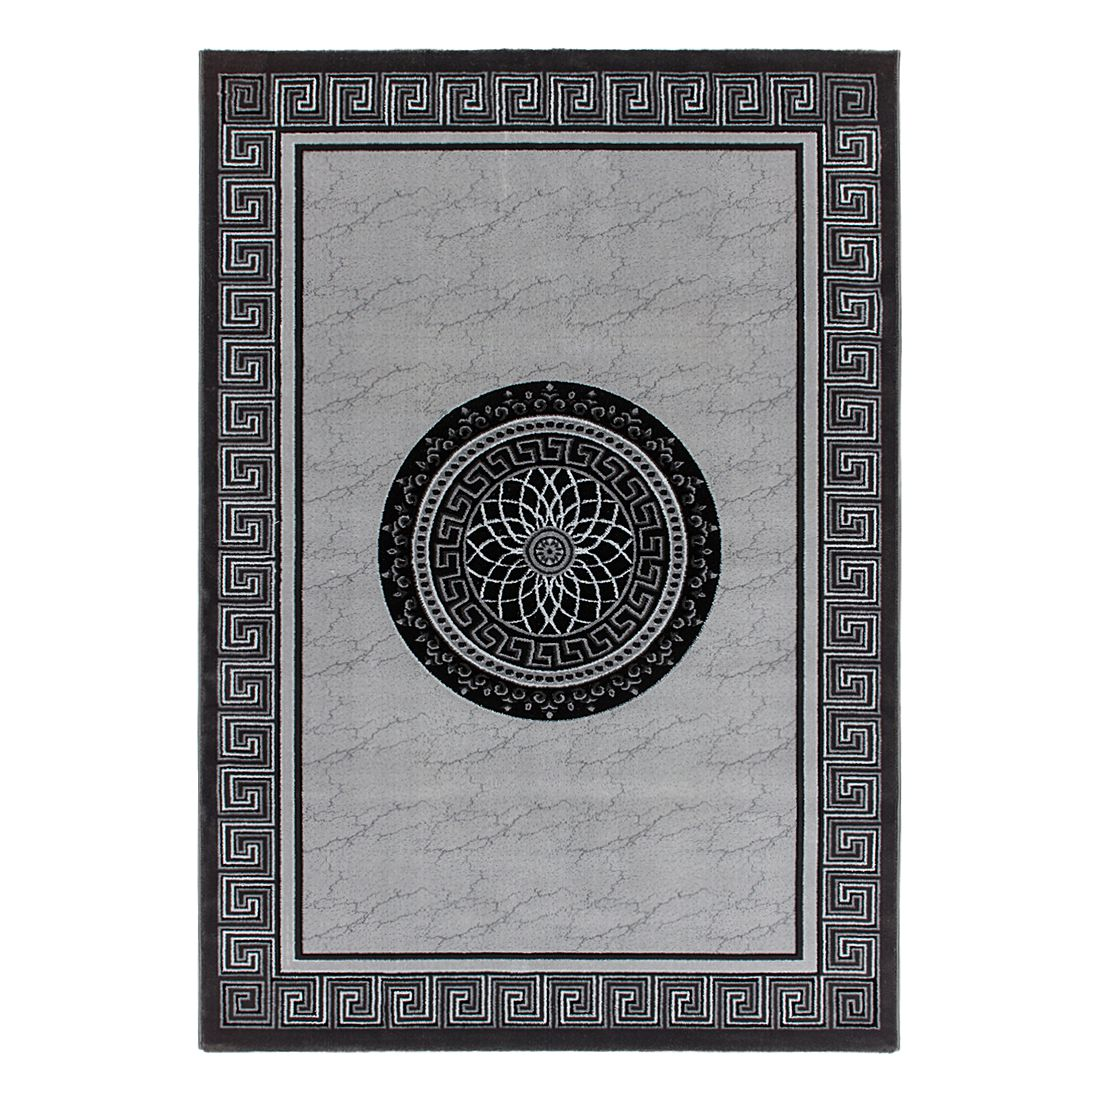 Aura 776 - 70% Polyester, 30% Modacryl Silber - 160 x 230 cm, Kayoom